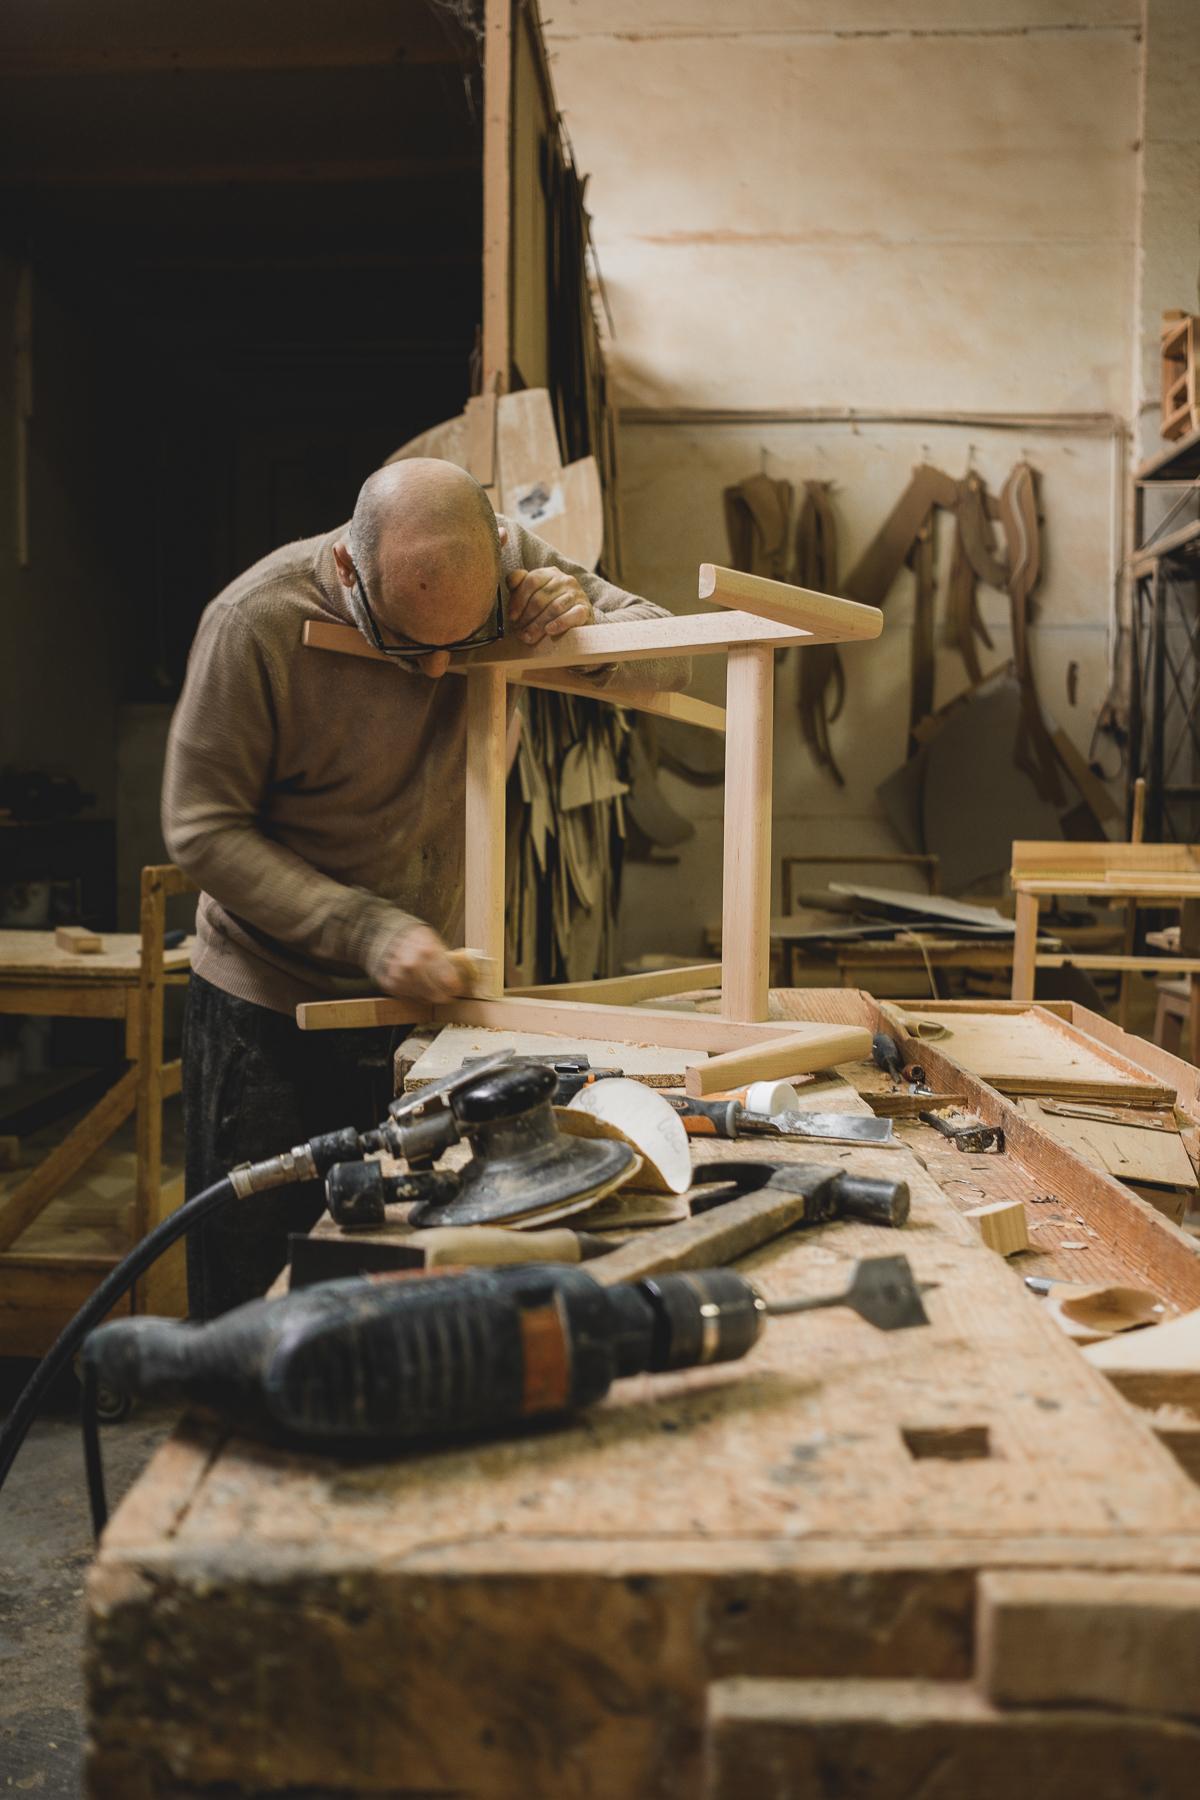 Larforma_Craftsmanship_wood.jpg